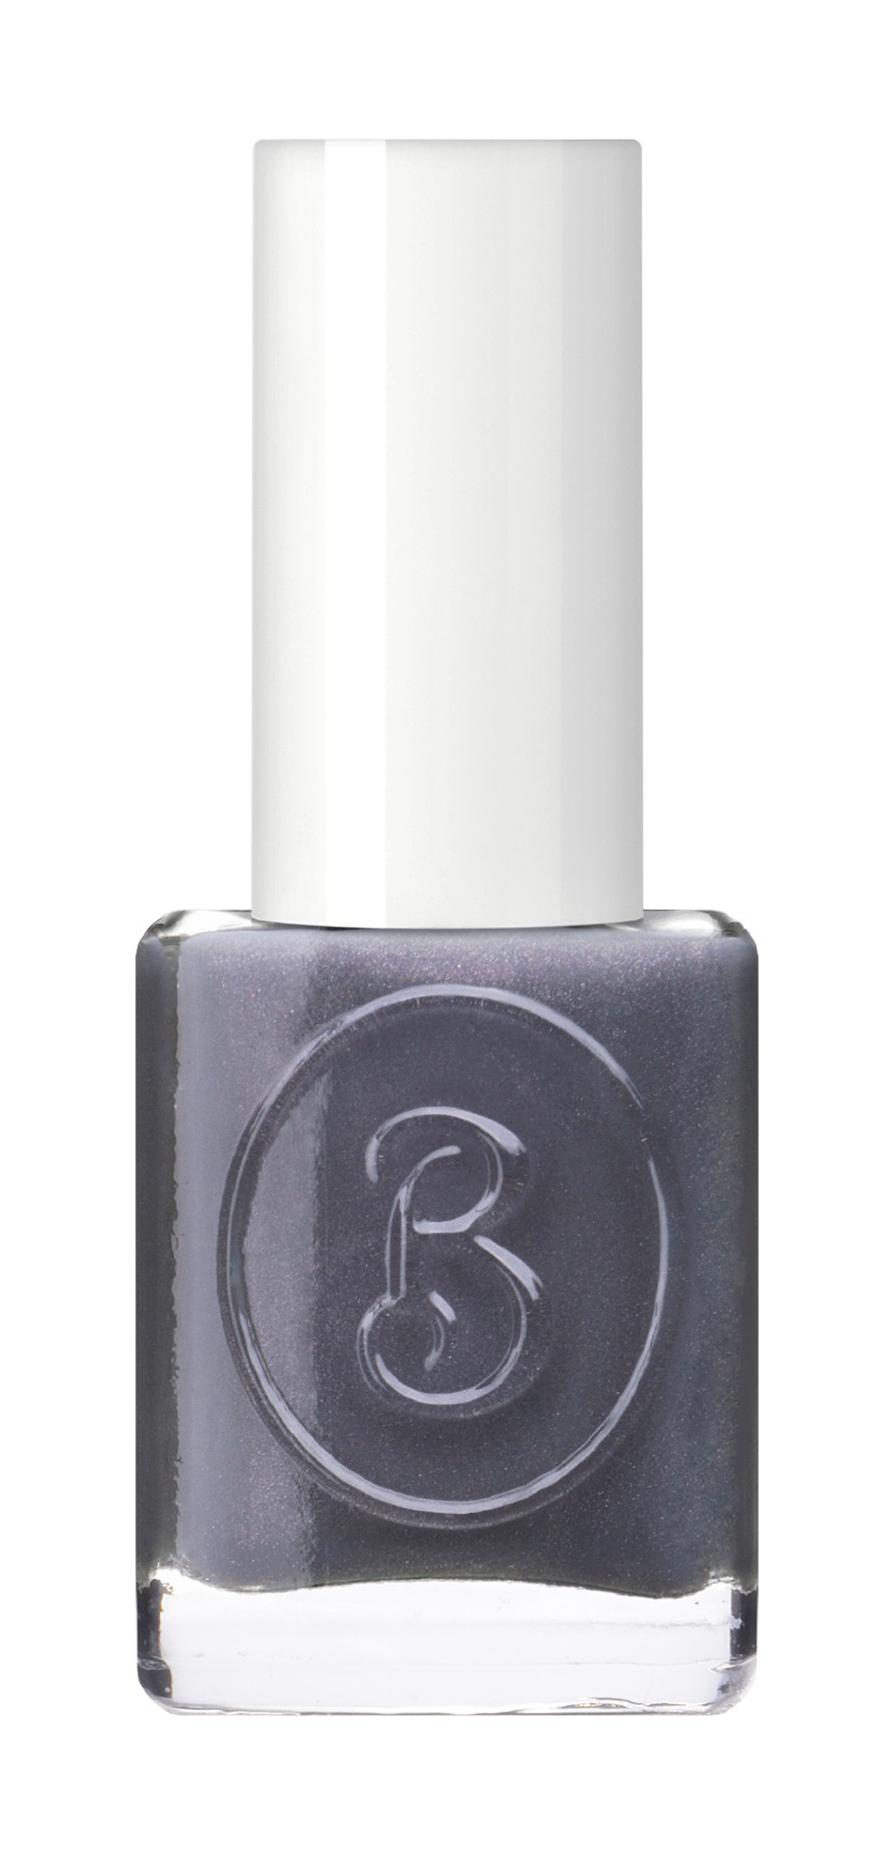 Лак для ногтей Berenice Oxygen Nail Lacquer 44 Silver Iron 15 мл по цене 415